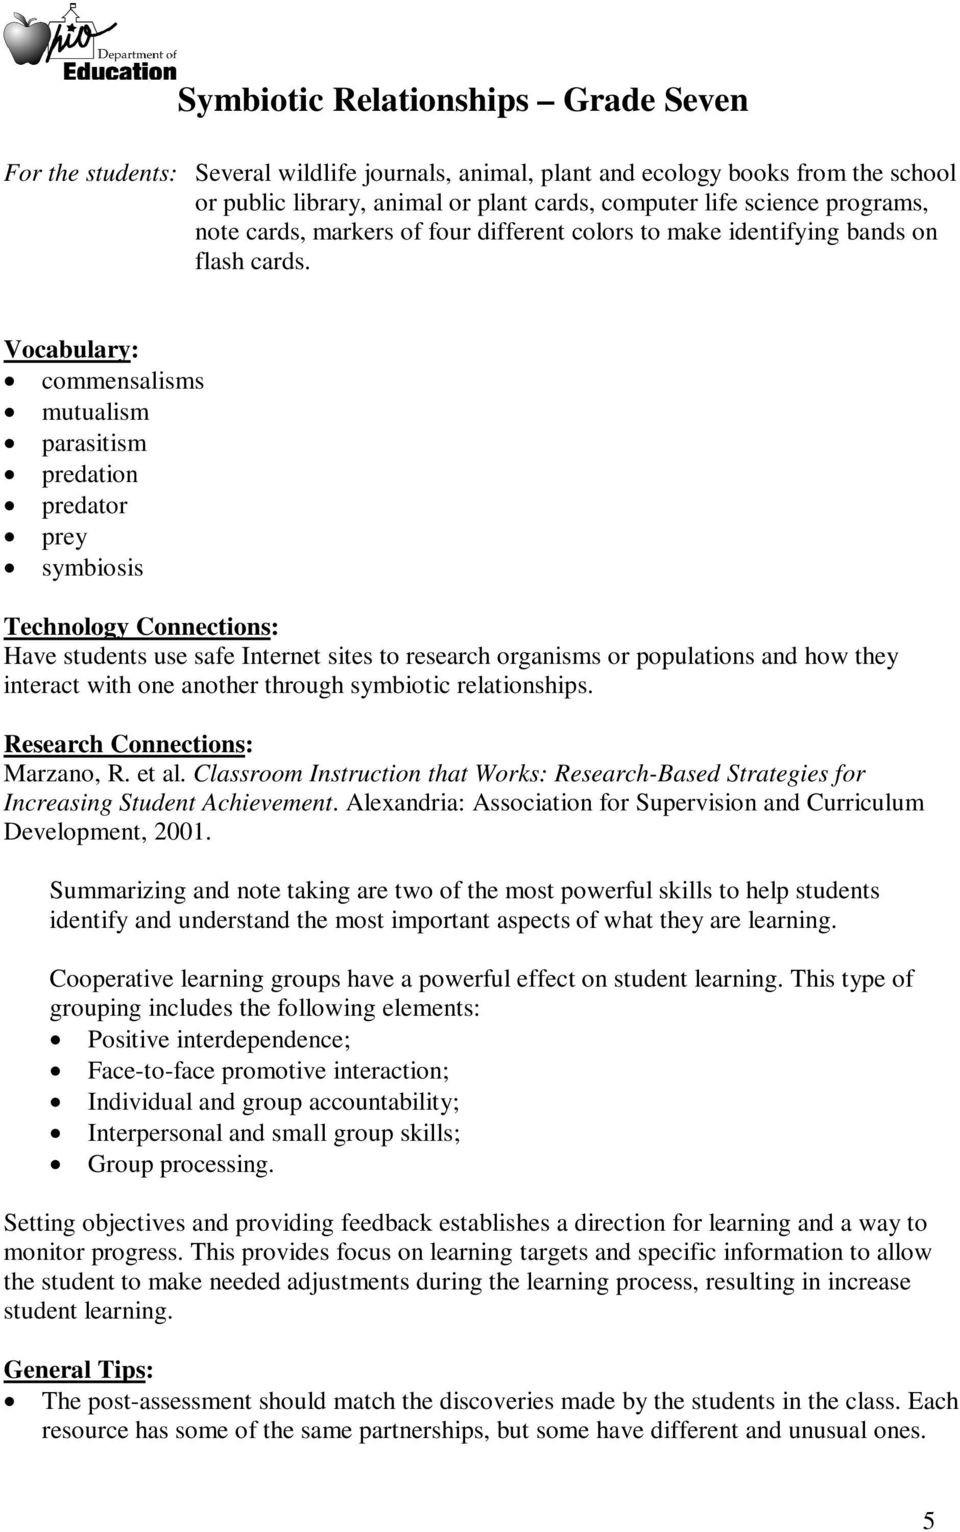 Symbiotic Relationships Worksheet Good Buddies Types Symbiosis Worksheet Answer Key Worksheet List